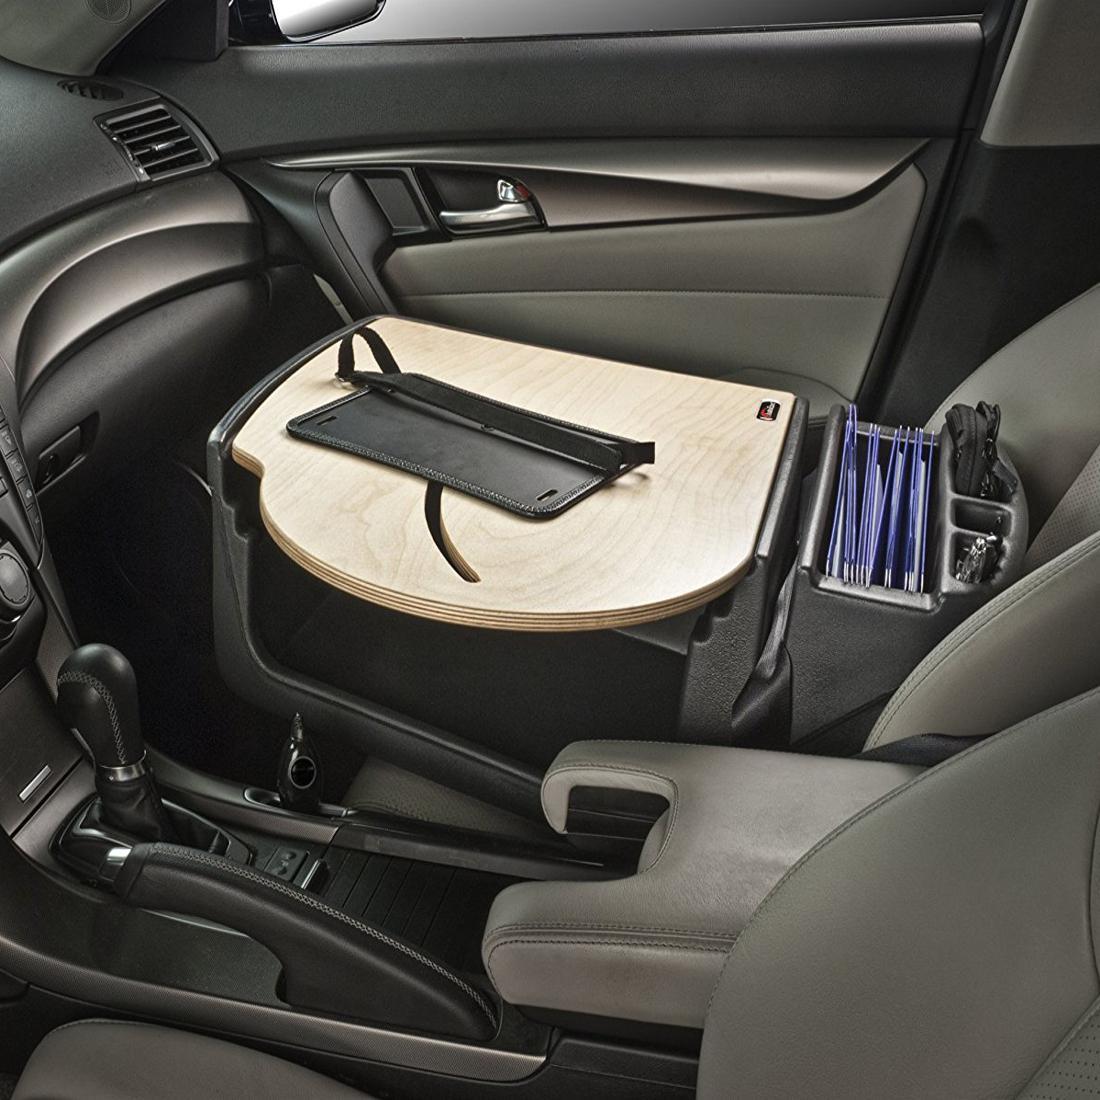 Amazon Com Autoexec Road Car 02 Roadmaster Car Desk With